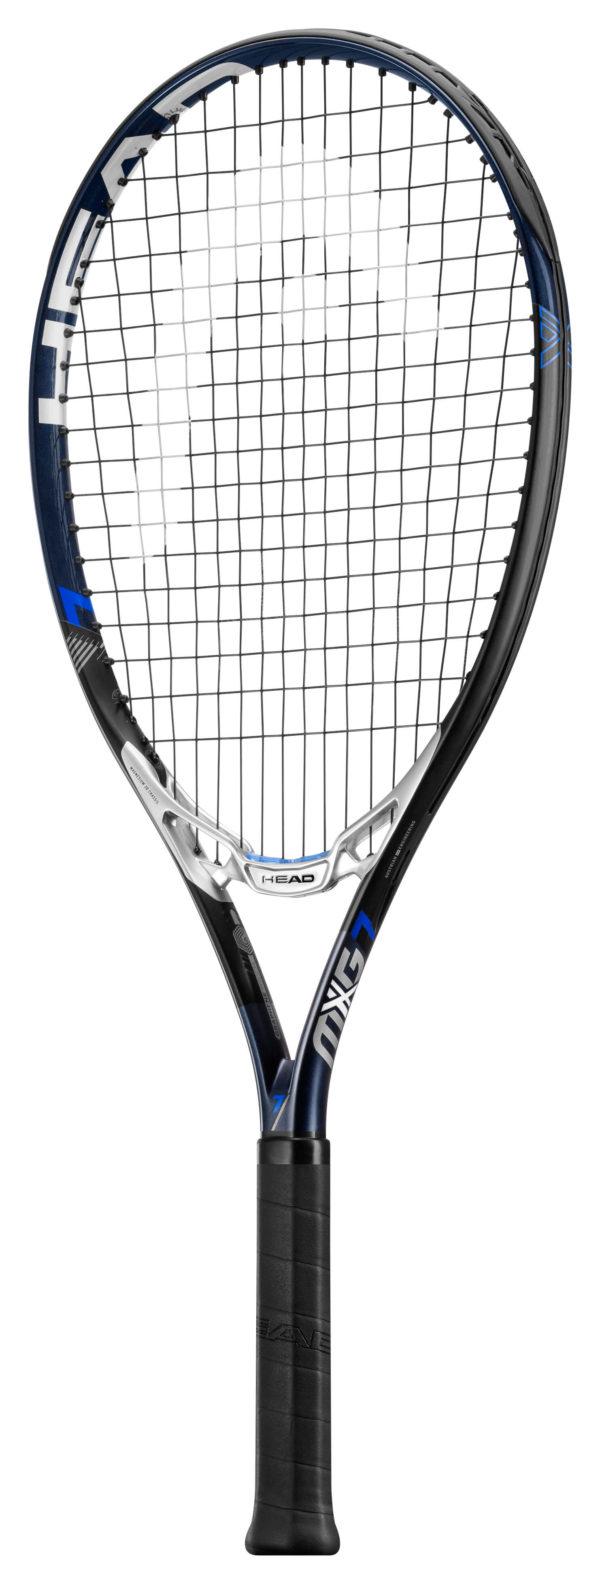 rakieta-tenisowa-head-238018_MXG_7_IMG_0023